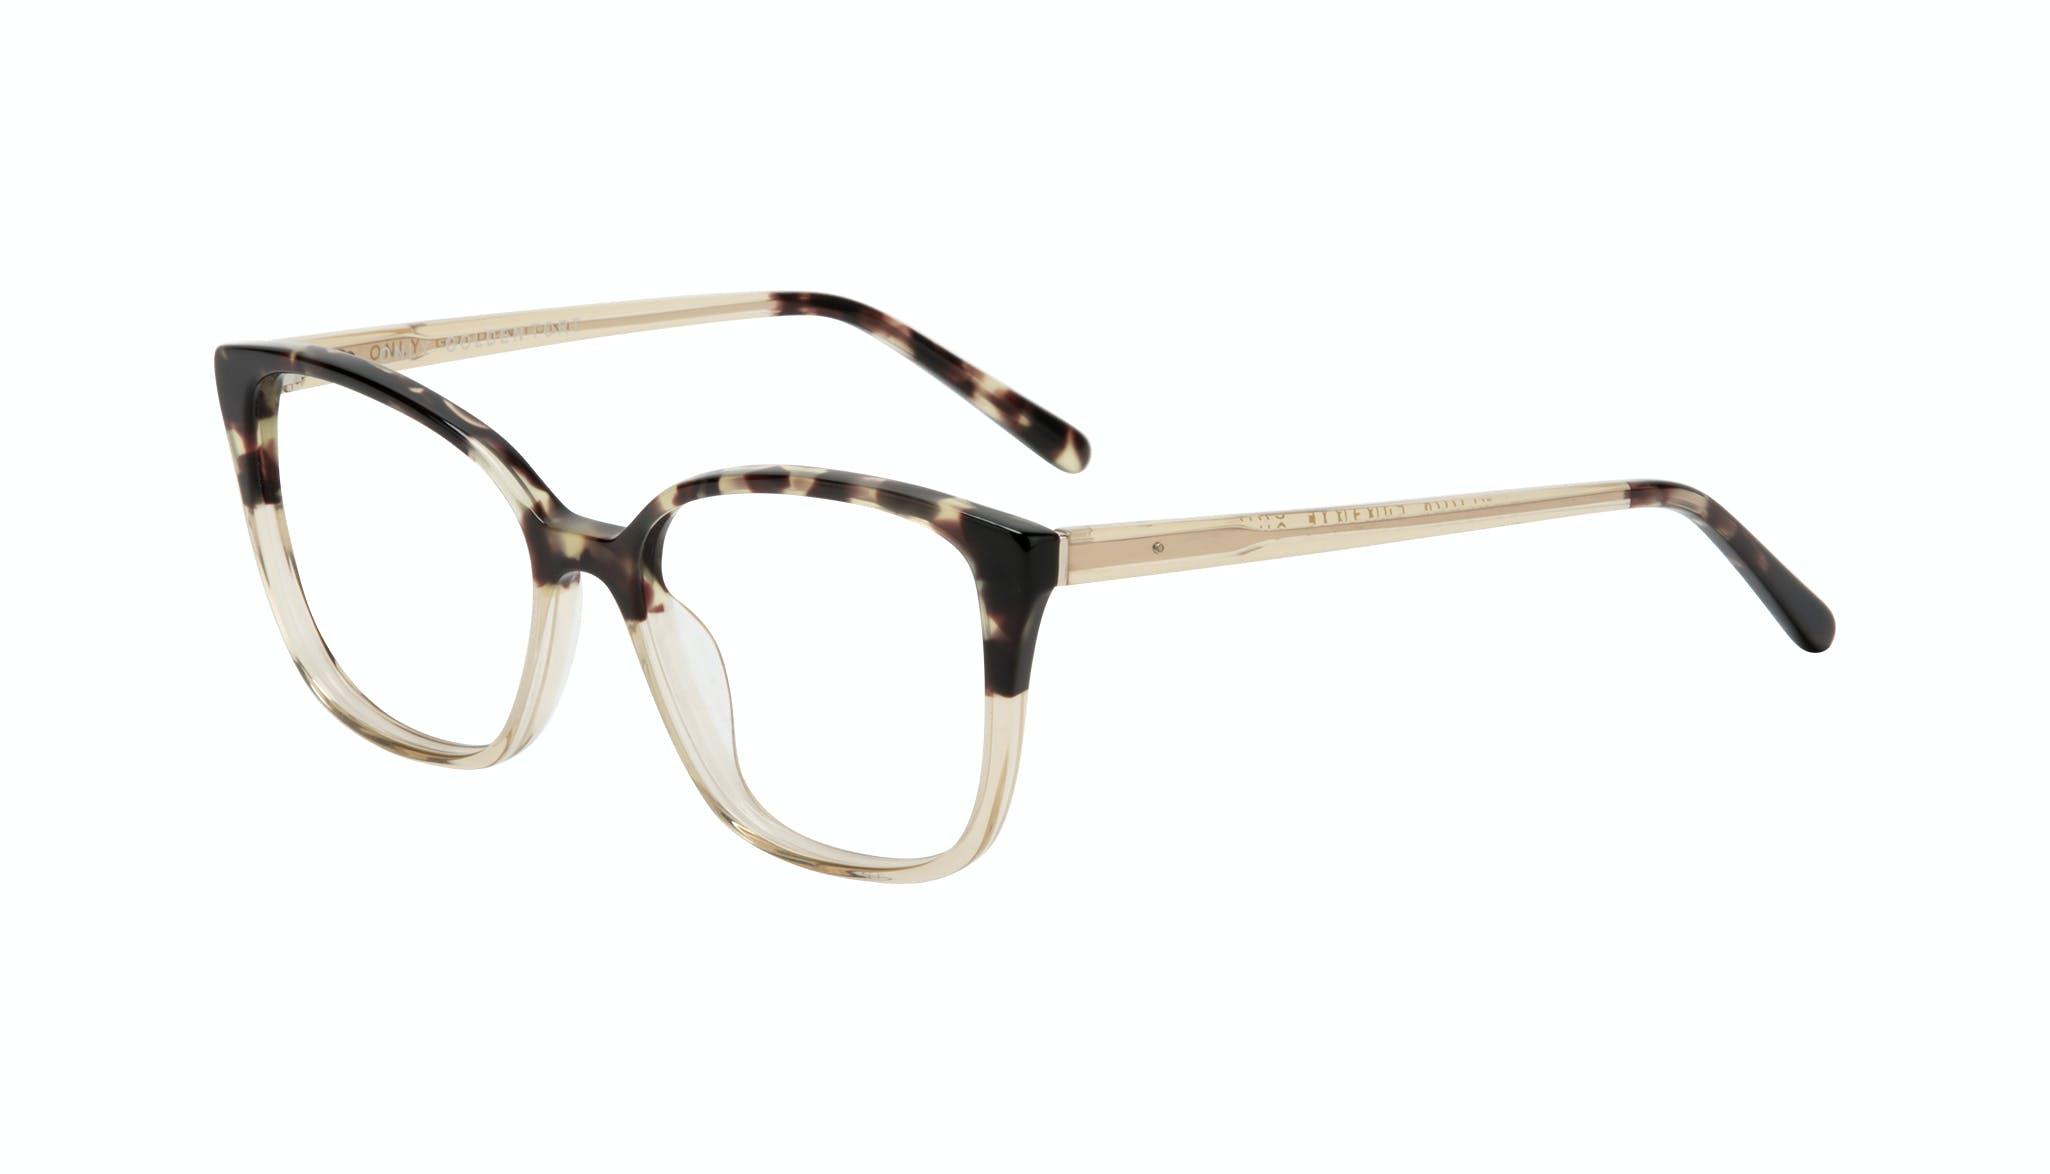 Affordable Fashion Glasses Square Eyeglasses Women Only Golden Tort Tilt